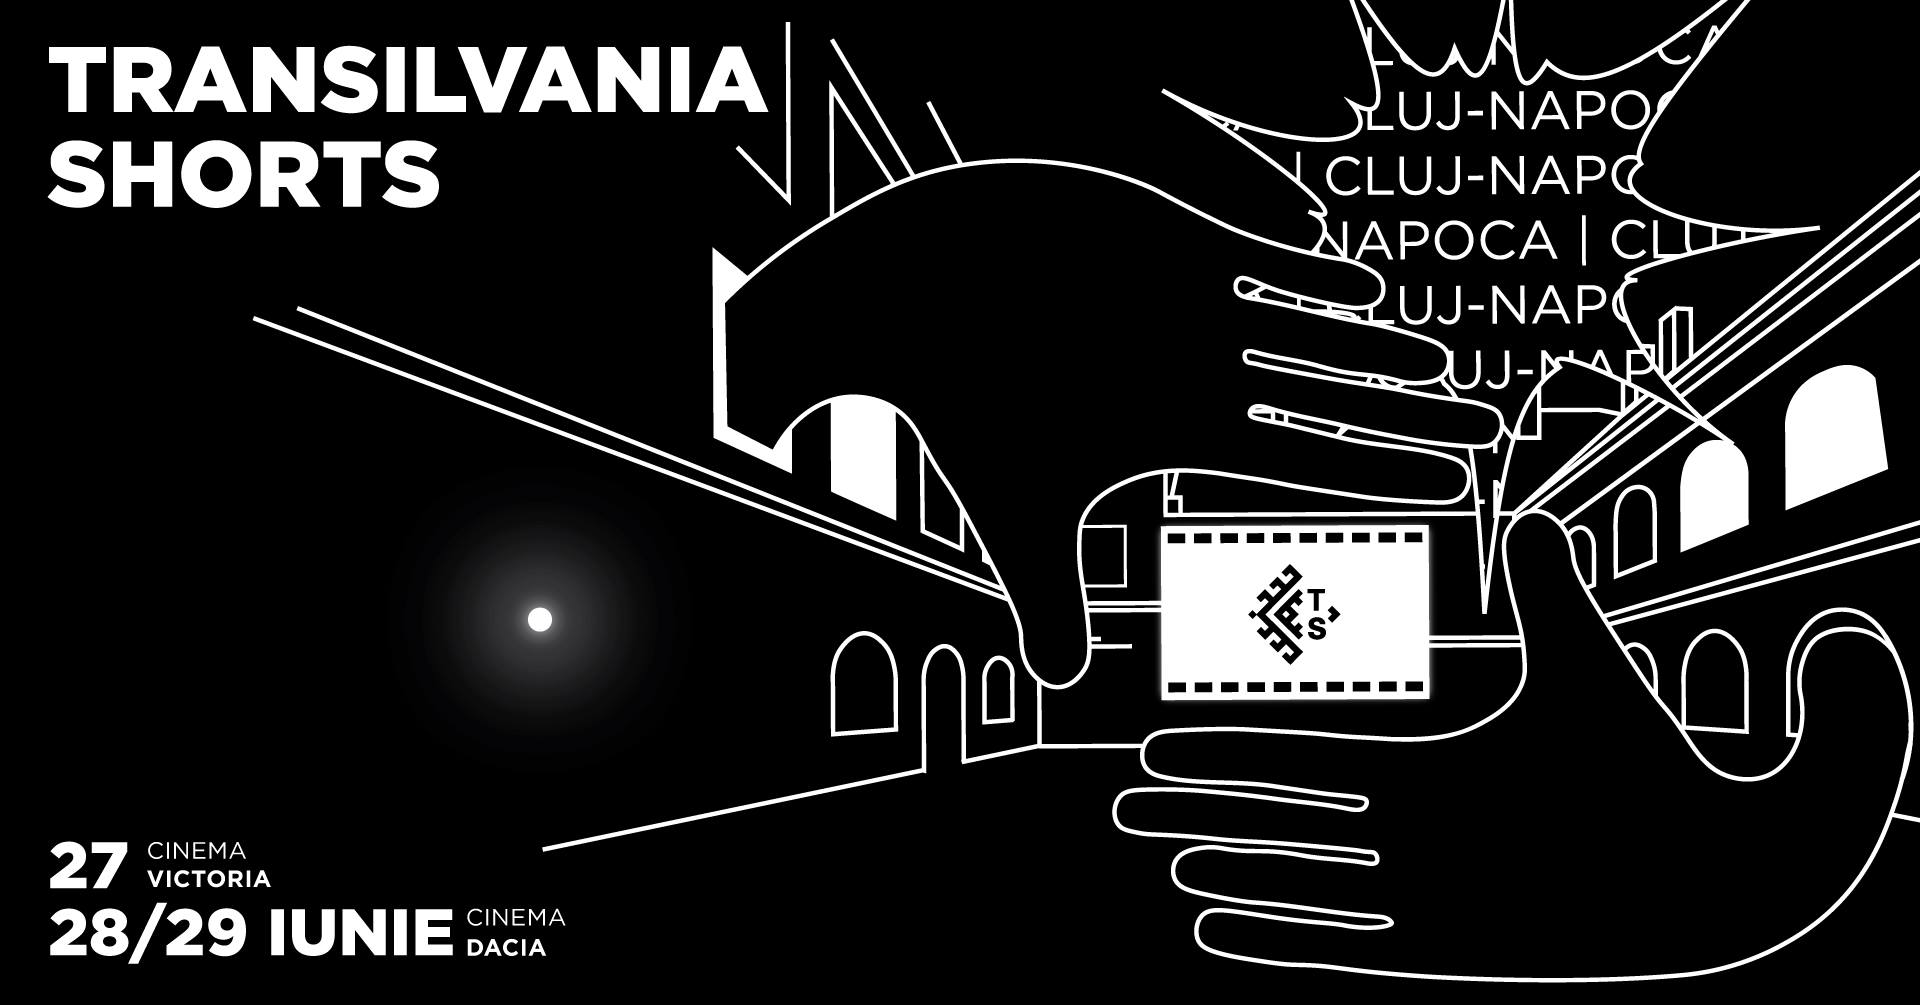 Transilvania Shorts 2021 - Ediția a 5-a